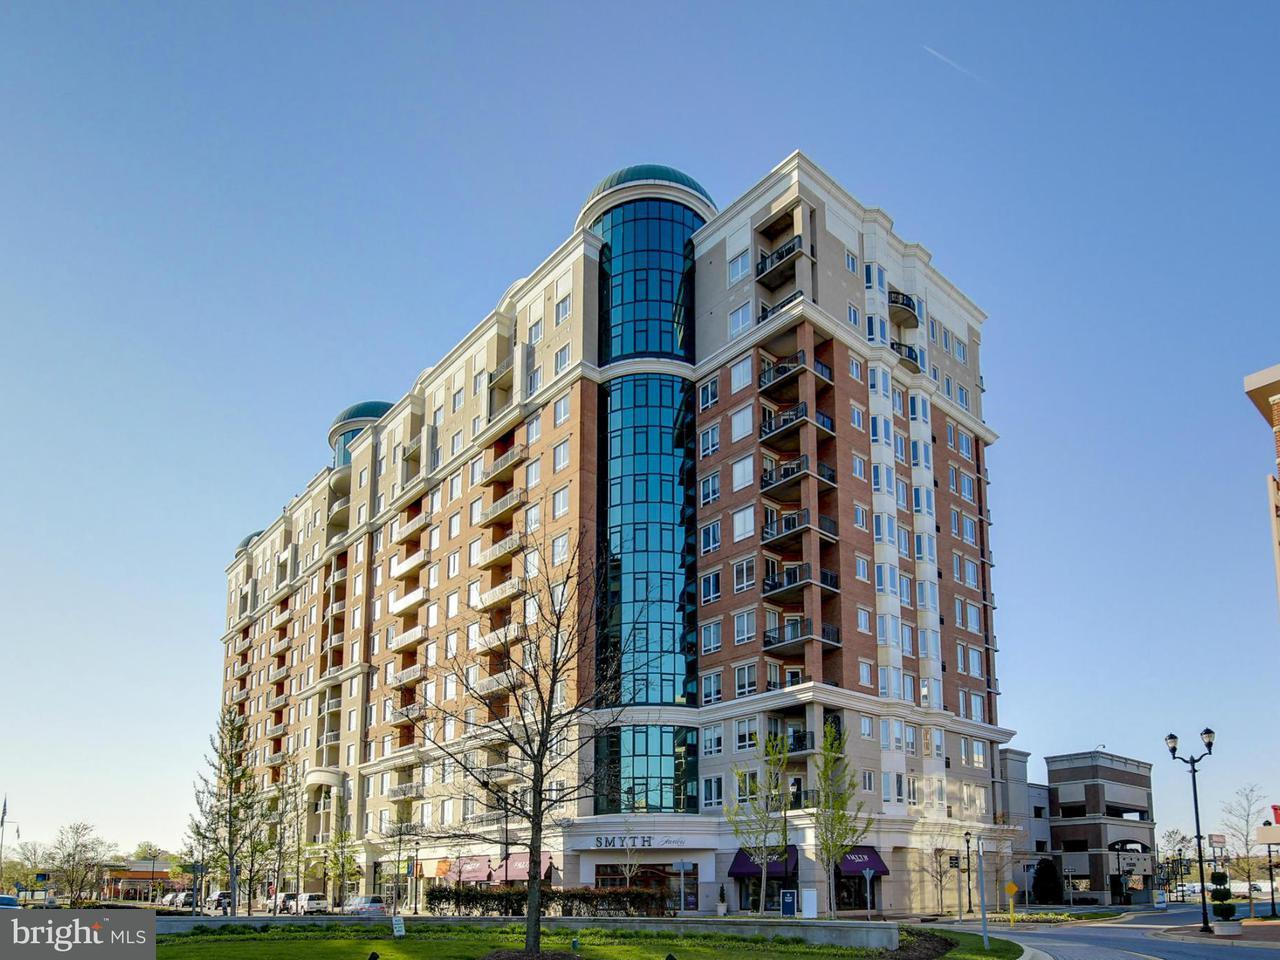 Condominium for Sale at 1915 Towne Centre Blvd #408 1915 Towne Centre Blvd #408 Annapolis, Maryland 21401 United States